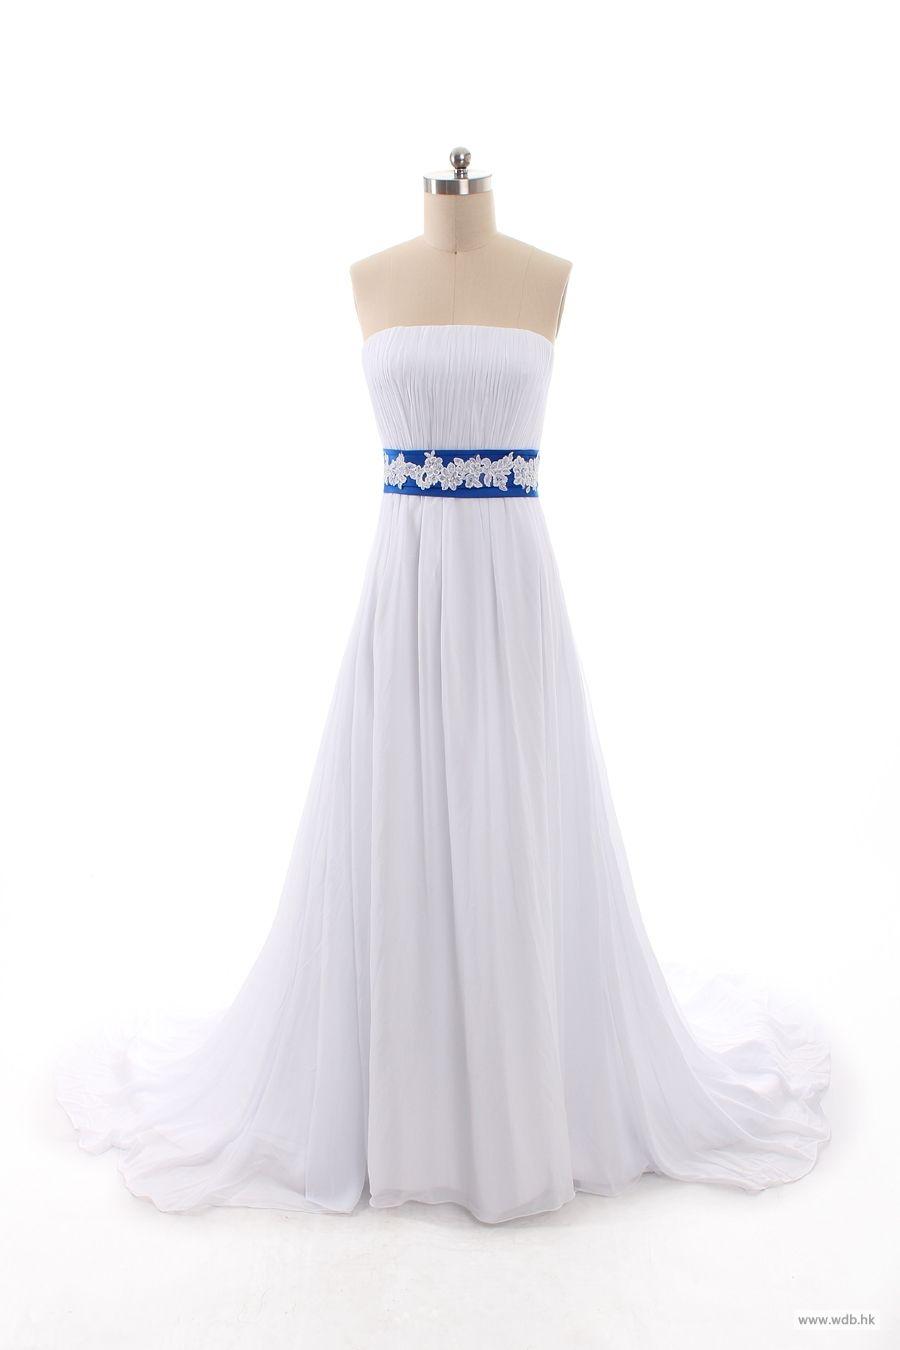 Vintage bridesmaid dresses strapless a line chiffon and satin vintage bridesmaid dresses strapless a line chiffon and satin wedding dress 21898 ombrellifo Images